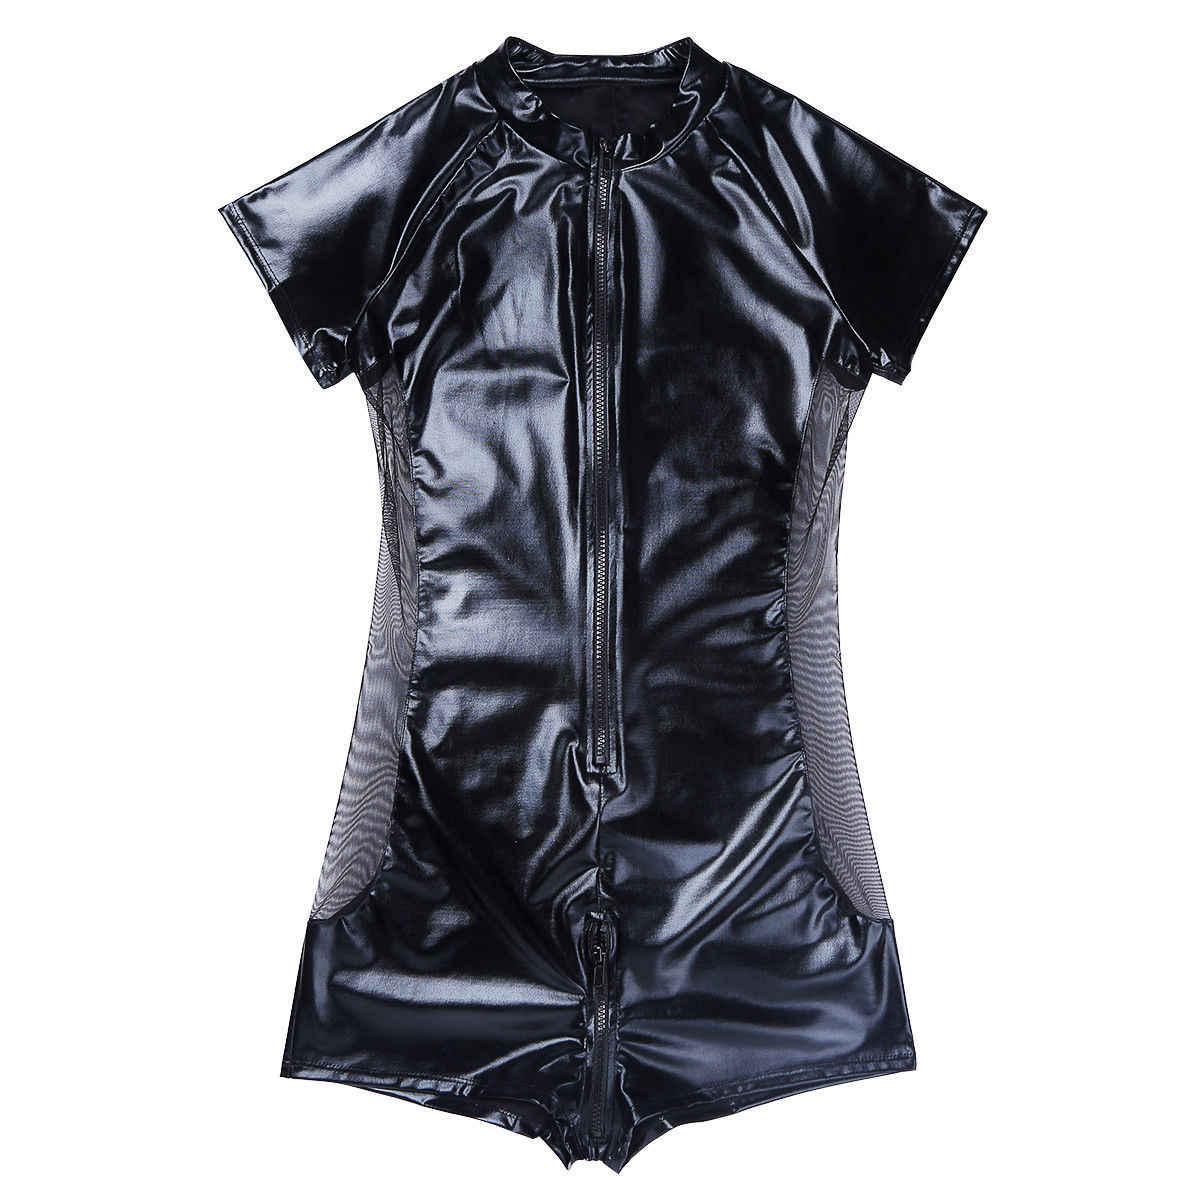 ANNJOLI S-3XL Men Cosplay PU Body Stocking Adult Sleepwear One Piece Pyjamas Male Jumpsuits Pacthwork Mesh Gay Jumpsuit